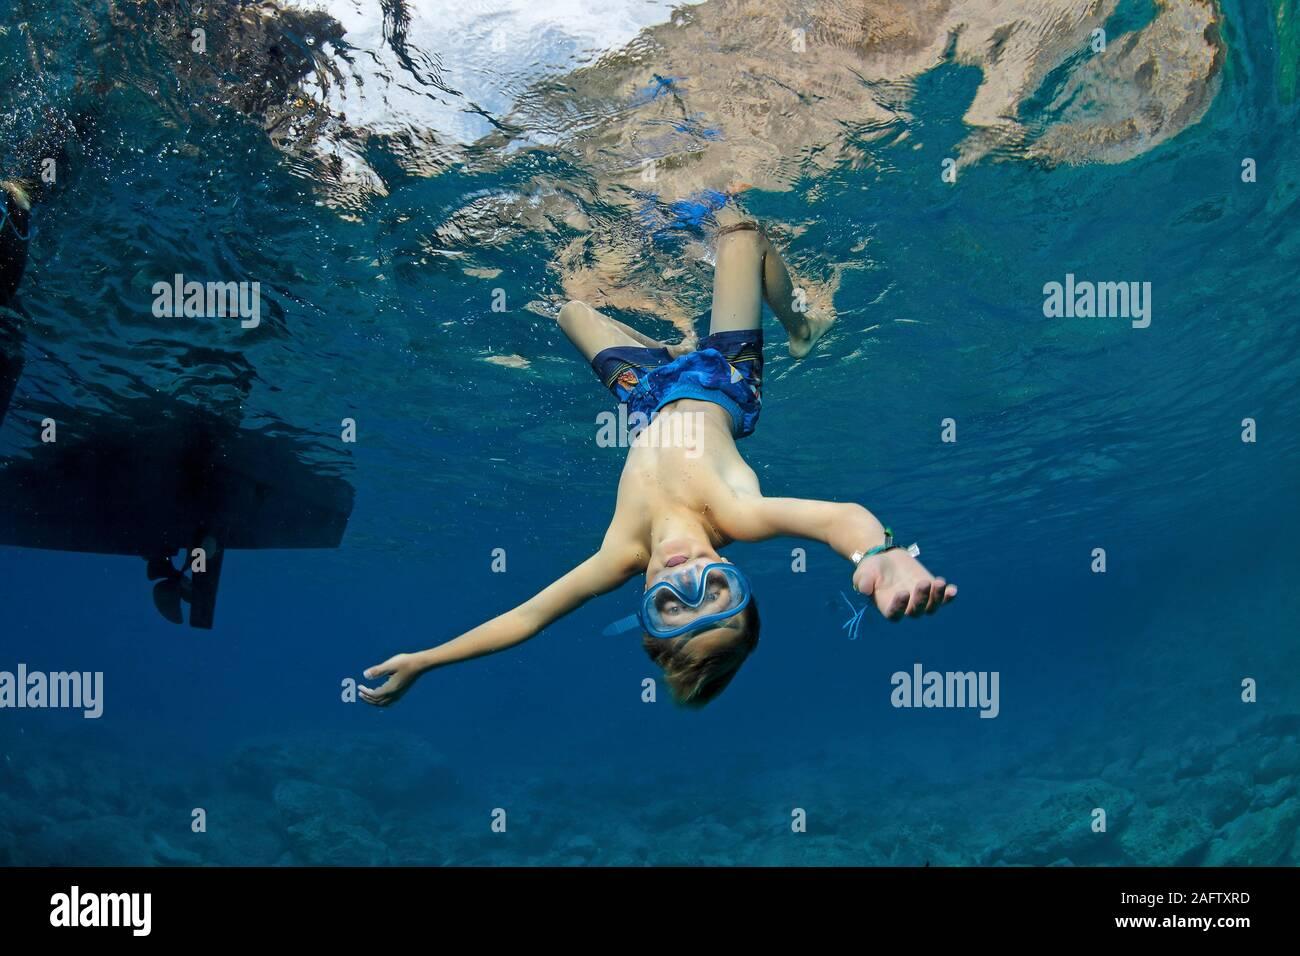 Child playful in warm Mediterranean sea, diving, Zakynthos island, Greece Stock Photo